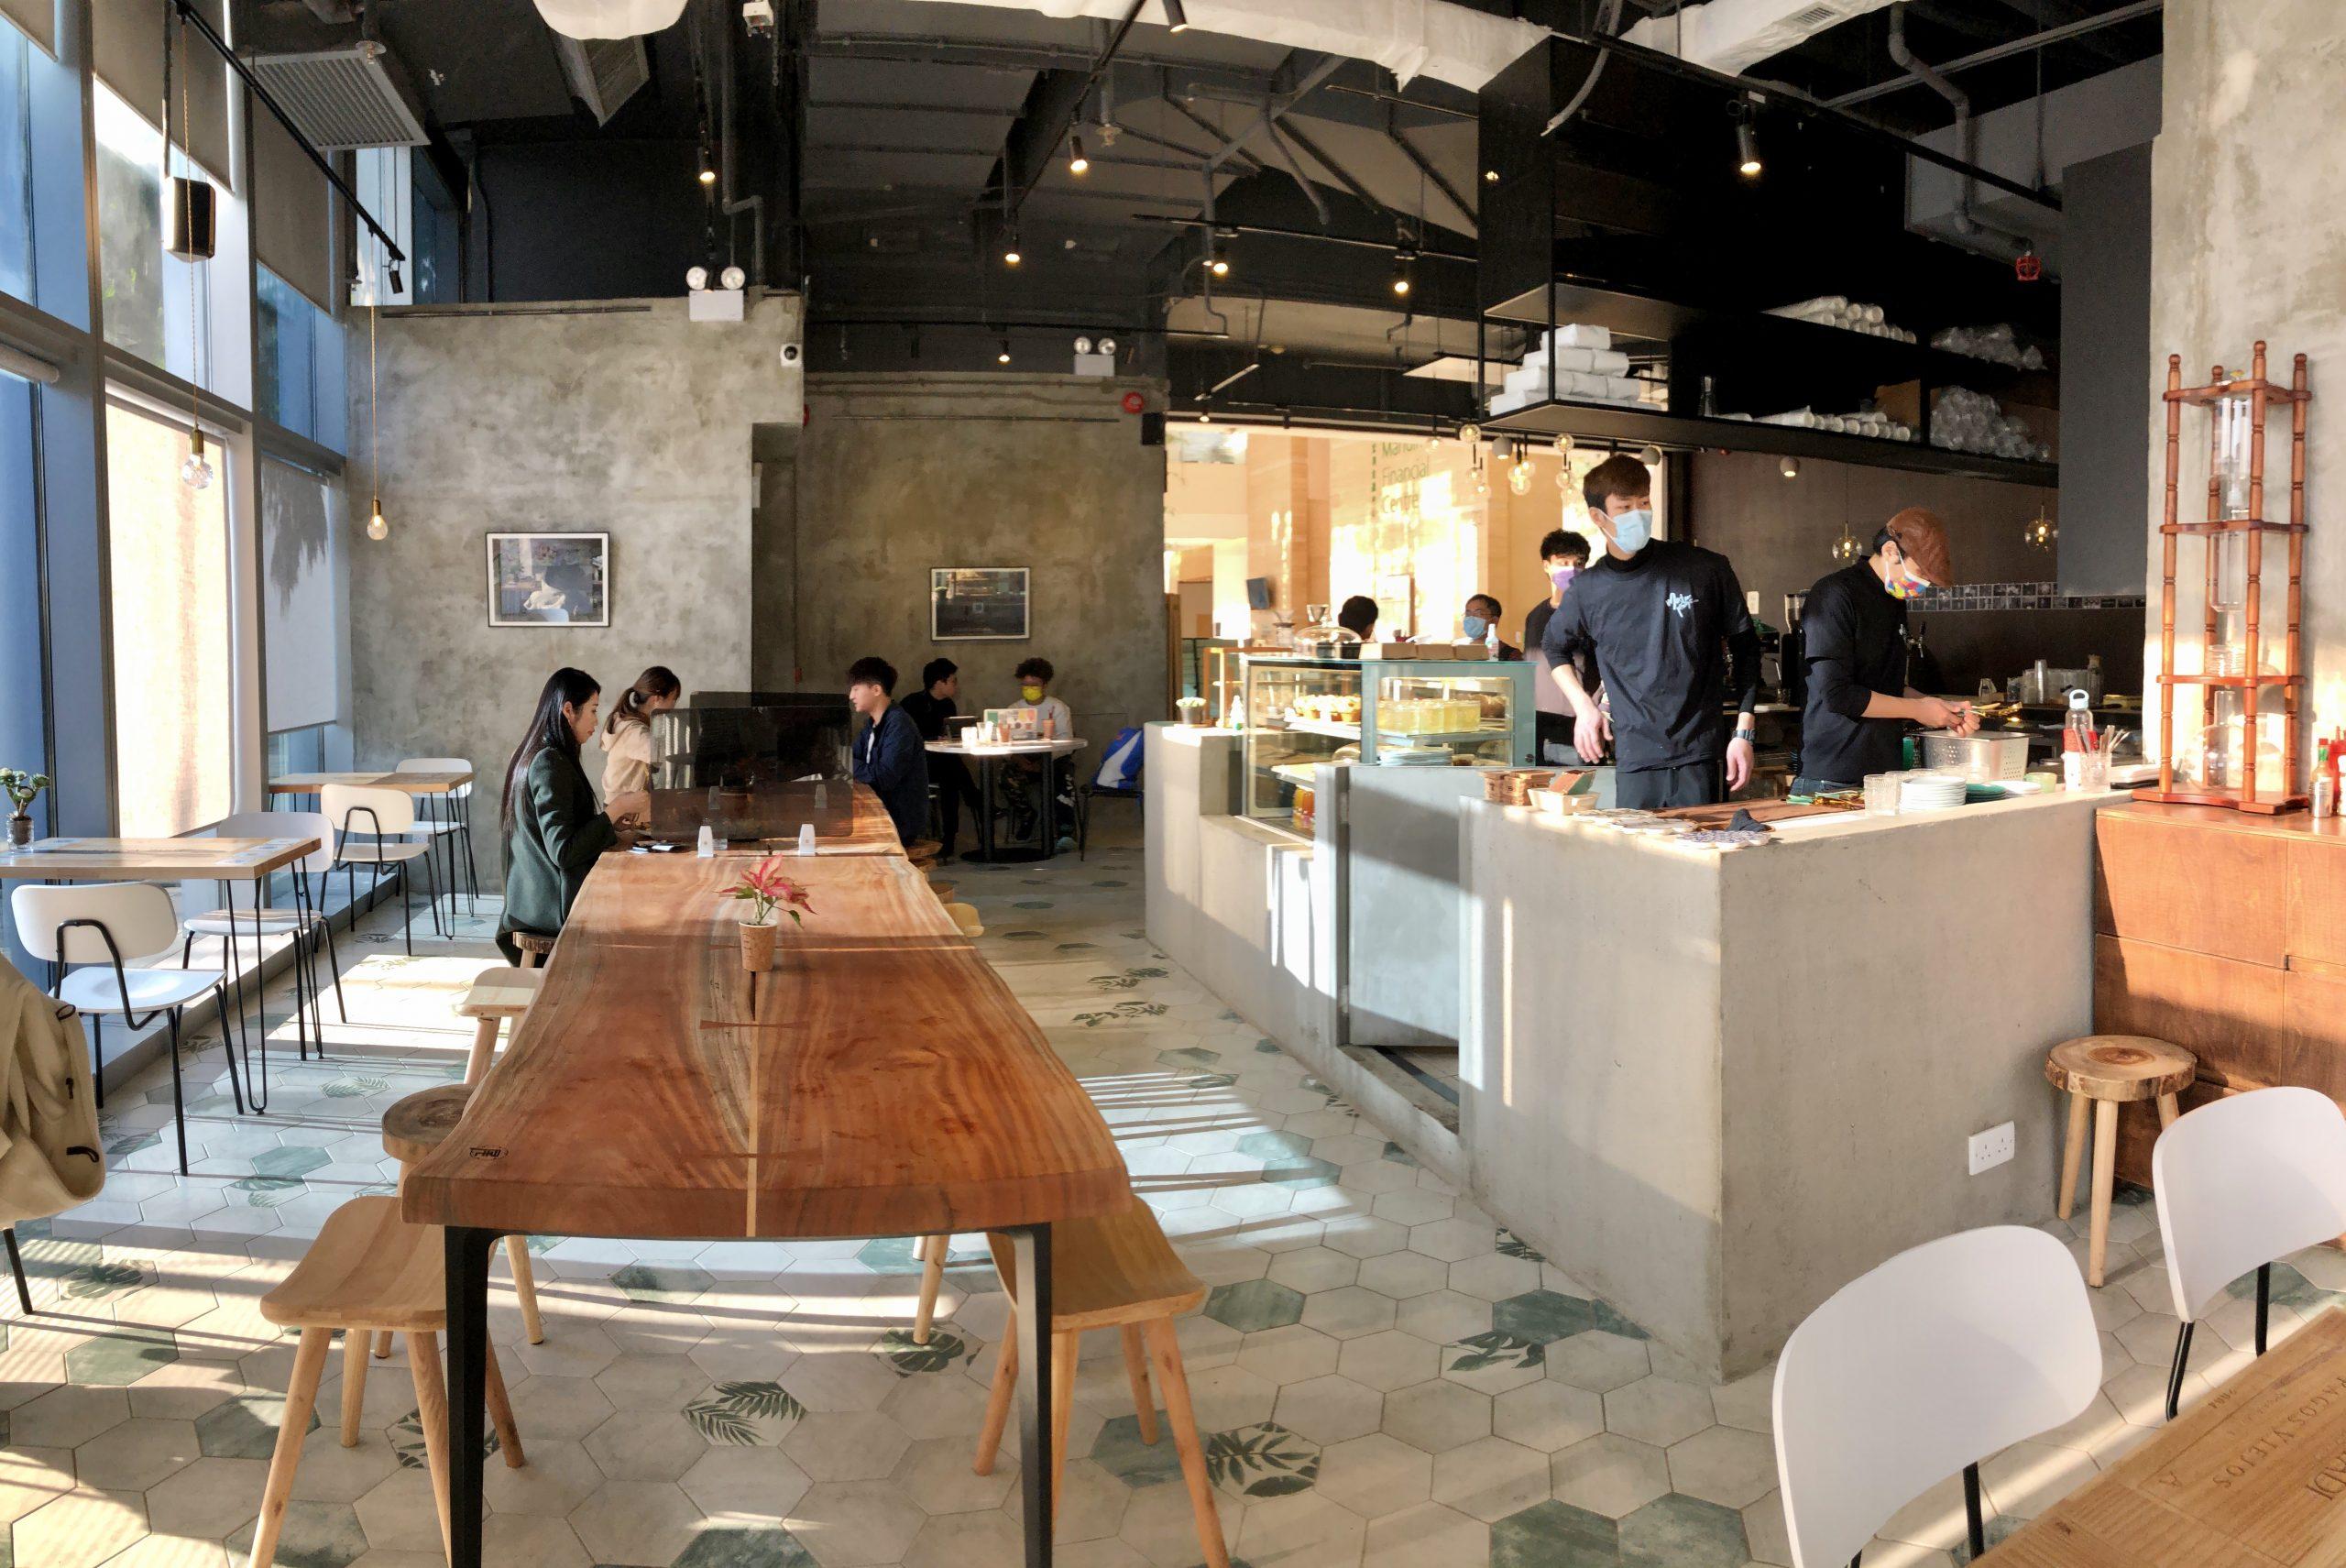 觀塘 Master Room Cafe One Little Room 咖啡店 宏利金融中心 環境